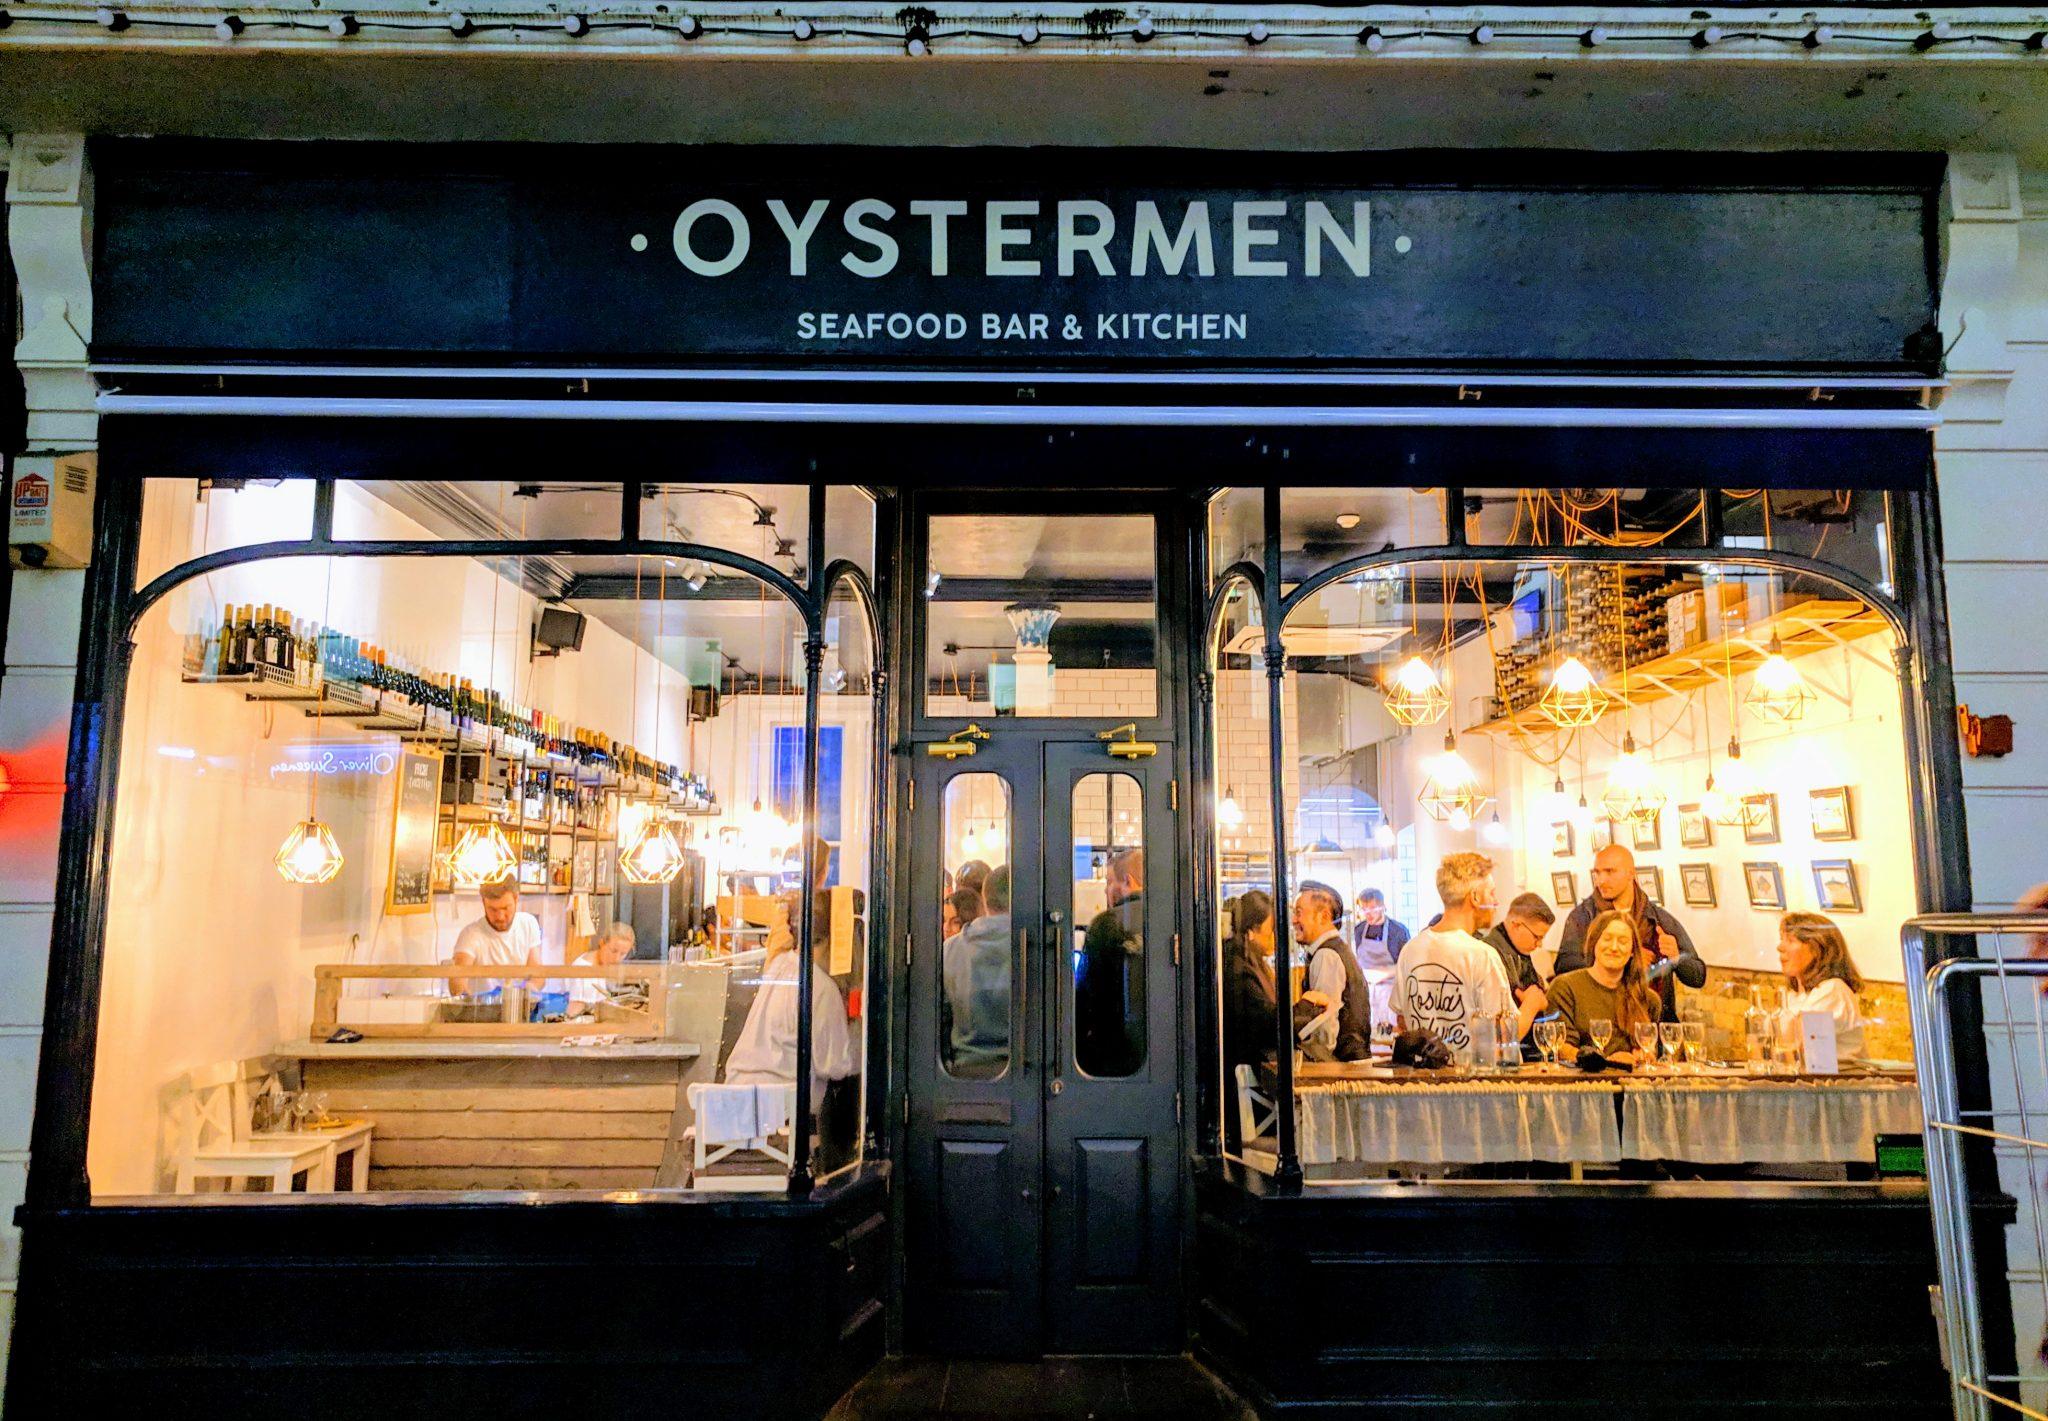 OYSTER x SAKE at Oystermen